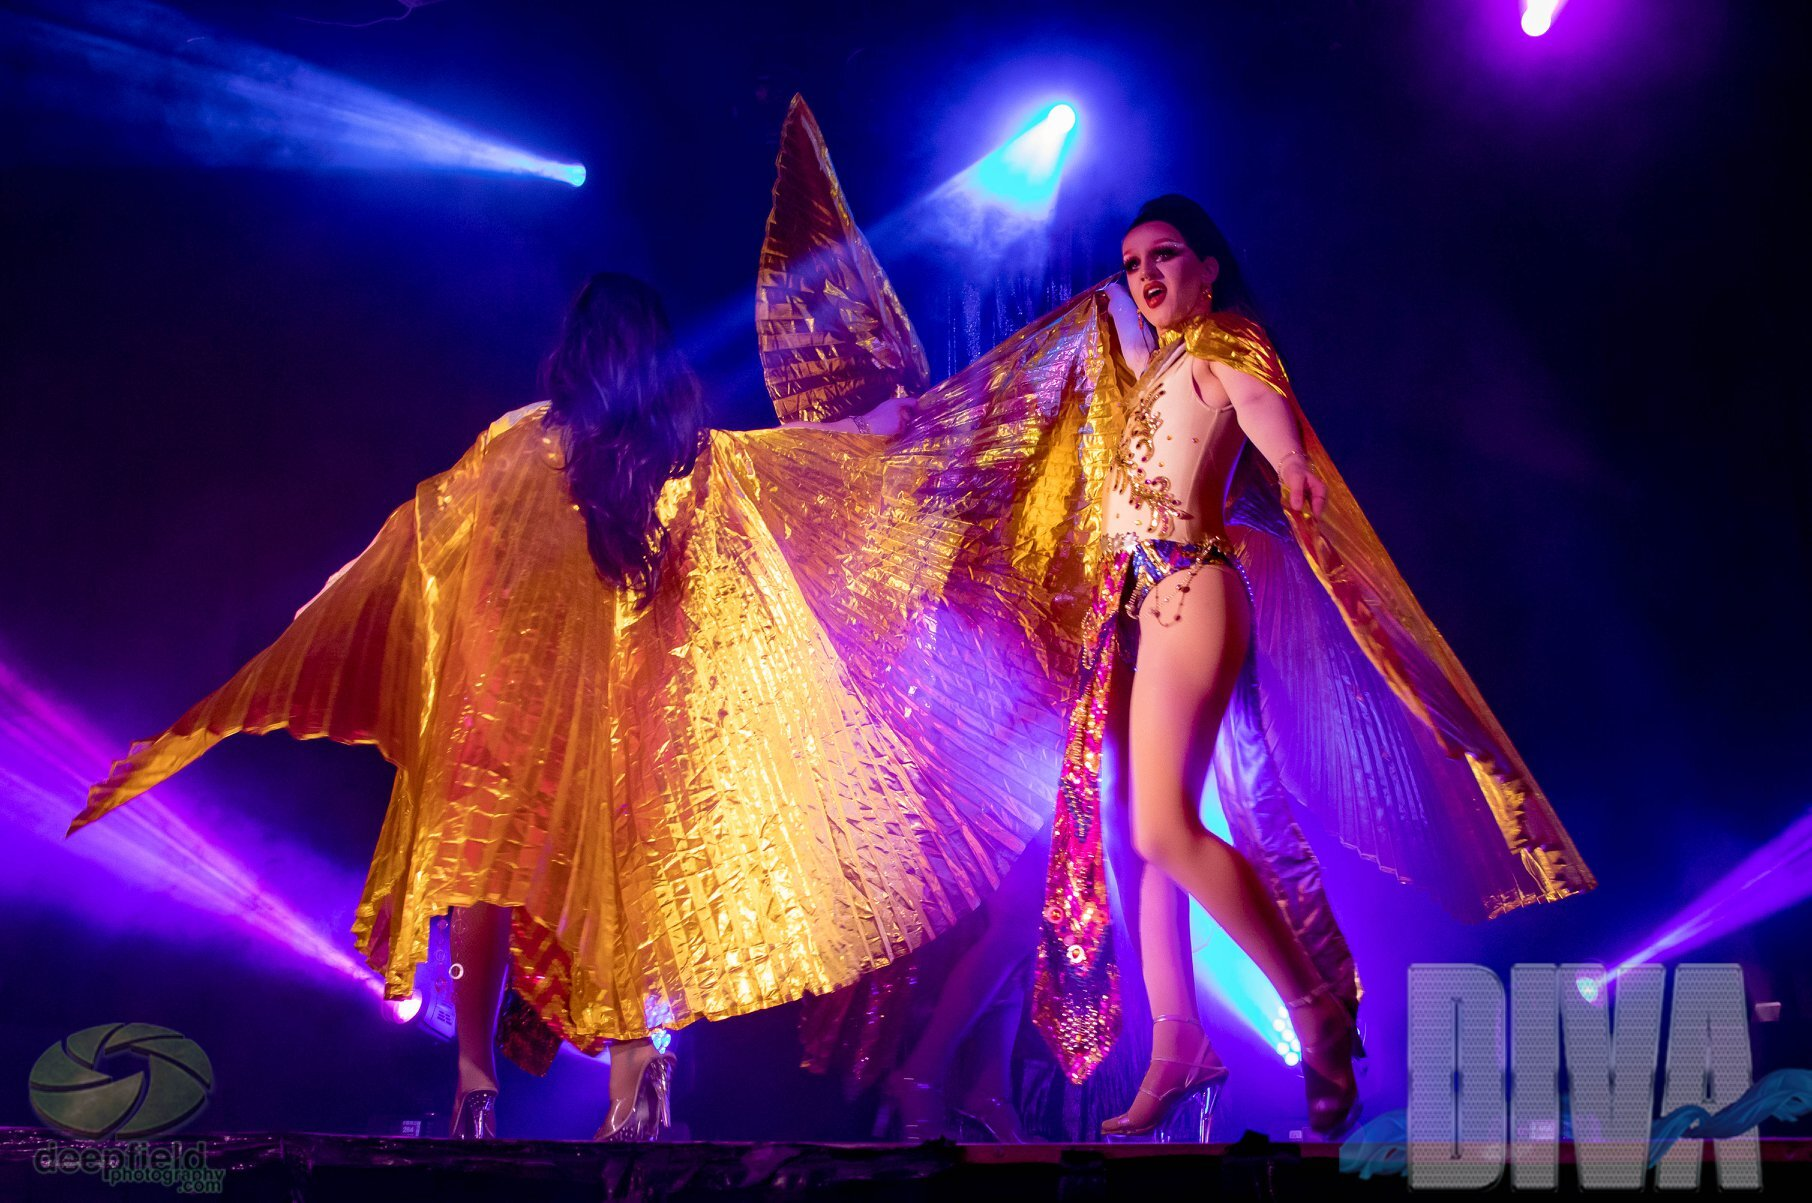 mynx-moscato-diva-awards-sydney-drag-queen-royalty-best-hire-drag-race-australia.jpg